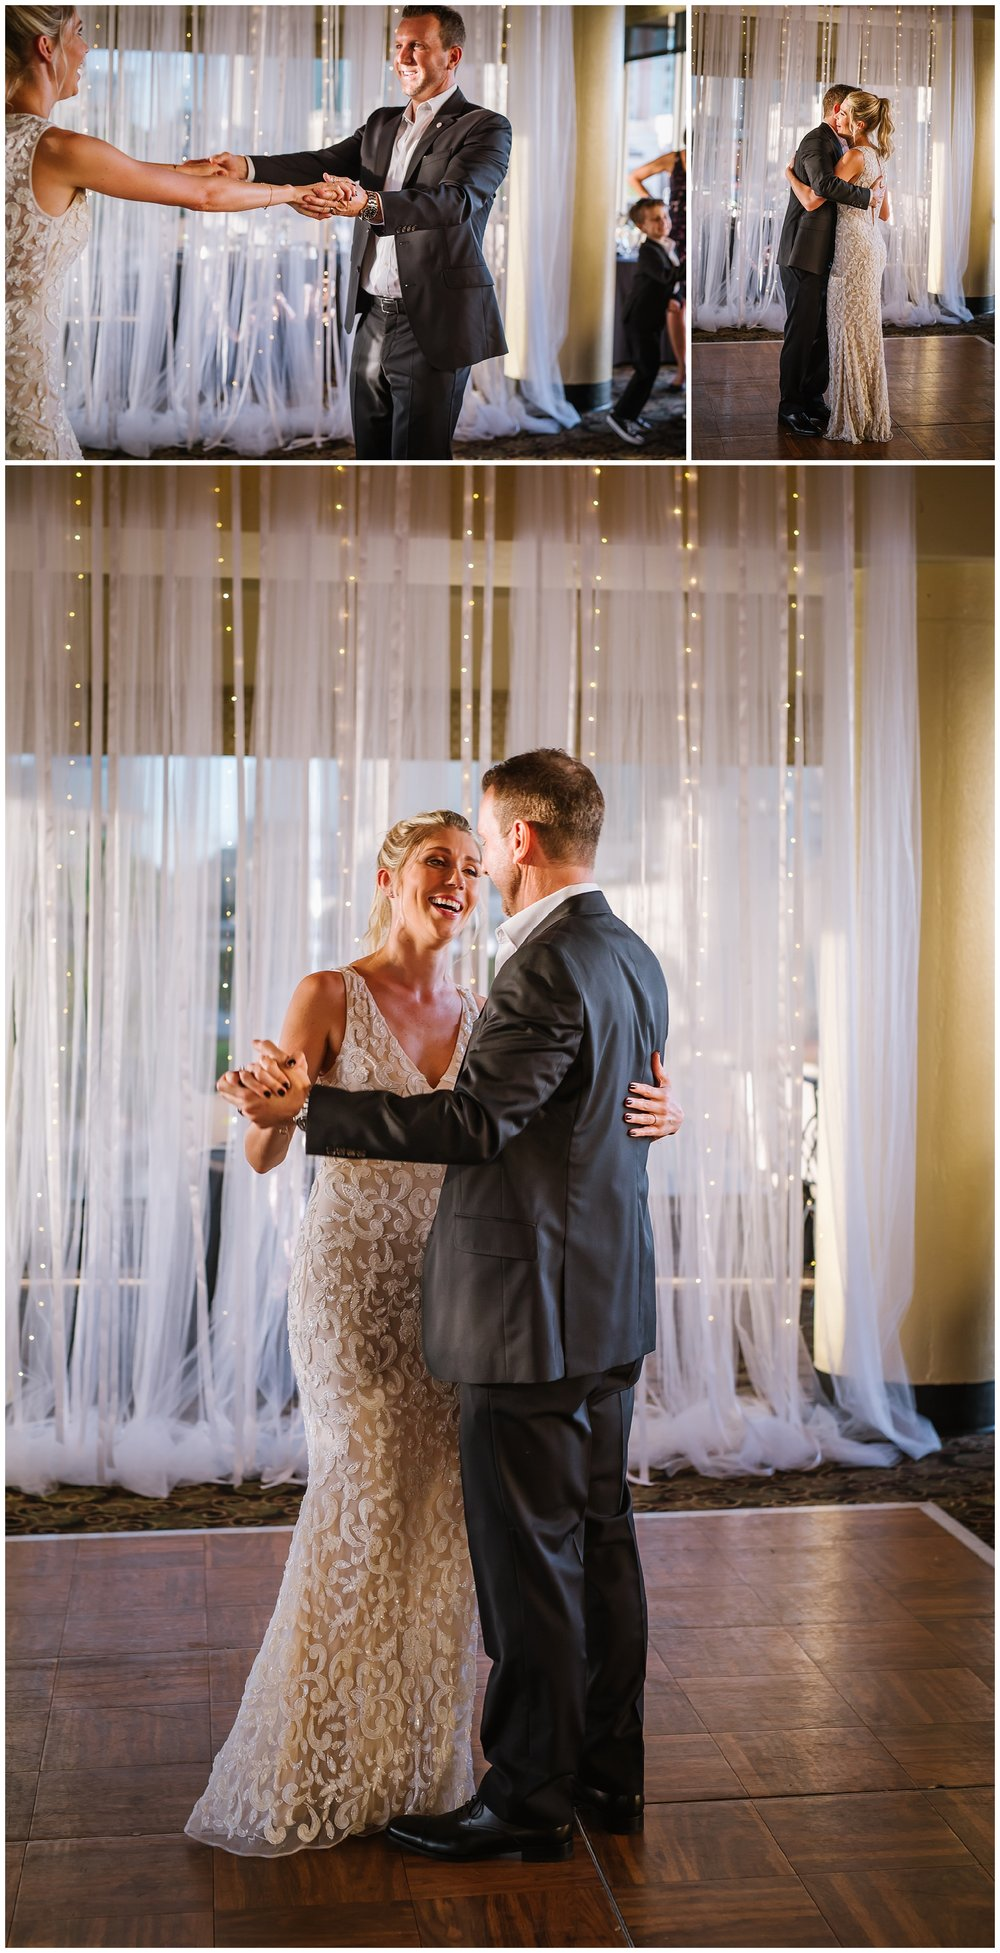 Tampa-wedding-photographer-downtown-bhldn-intimate_0052.jpg